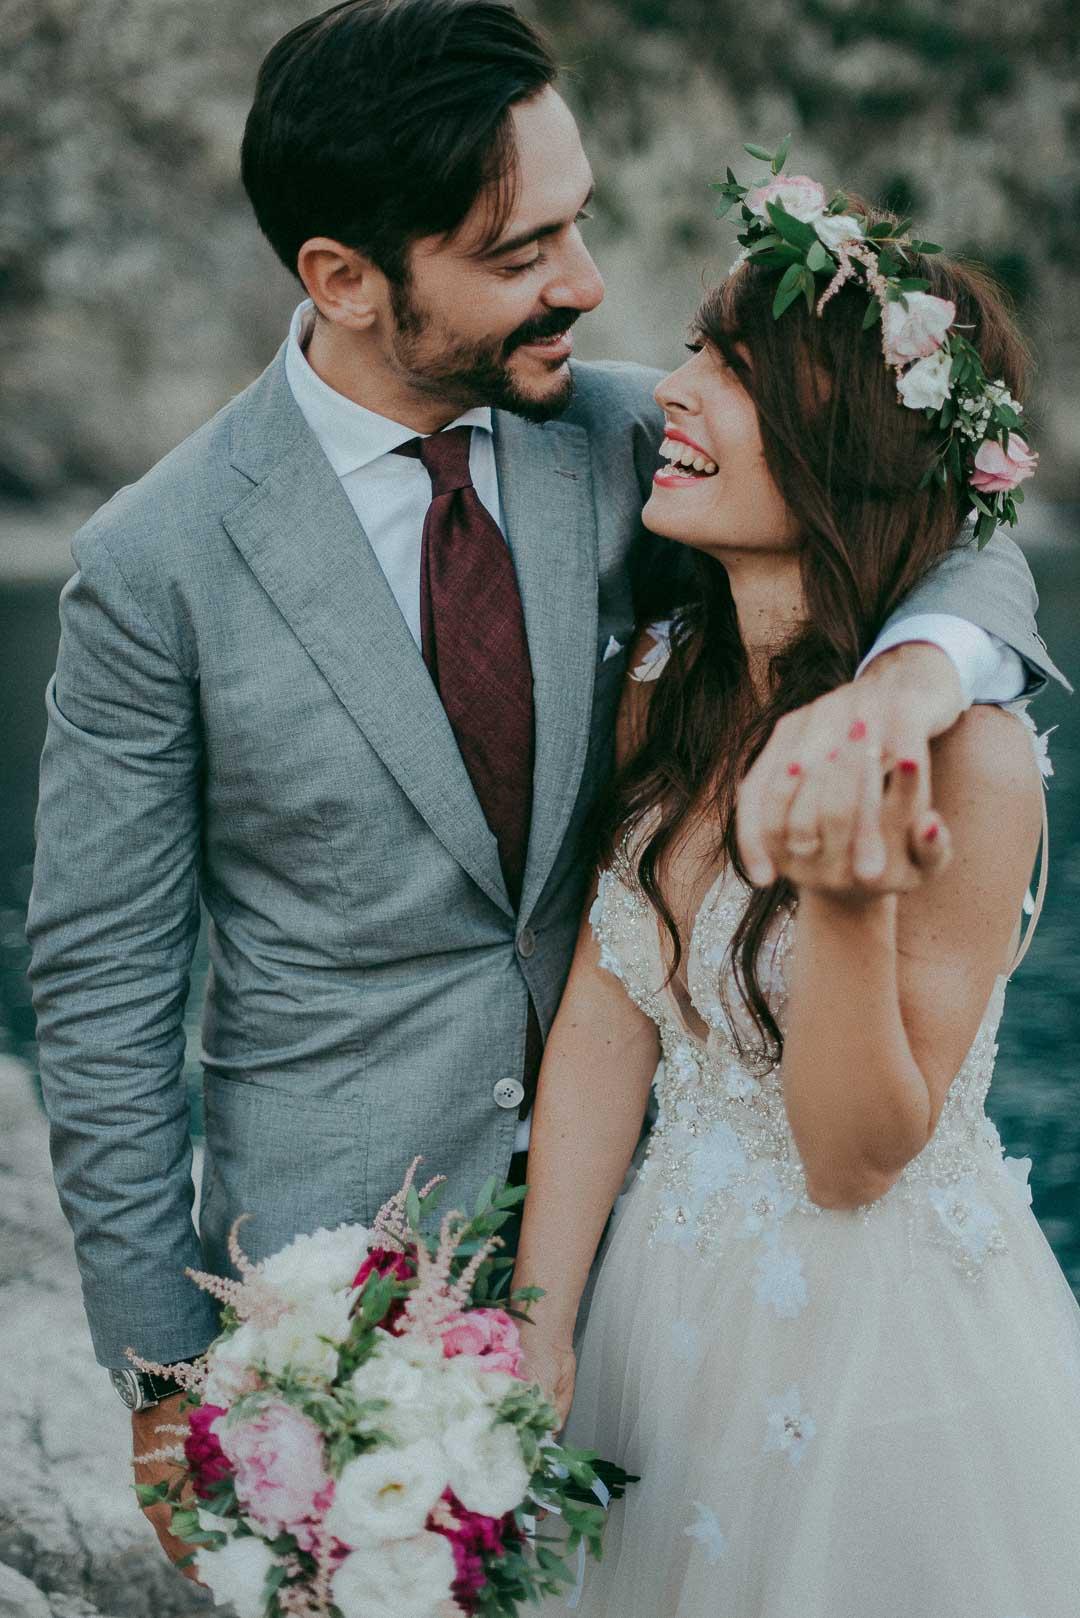 wedding-photographer-destination-fineart-bespoke-reportage-amalficoast-torrelacerniola-vivianeizzo-spazio46-76